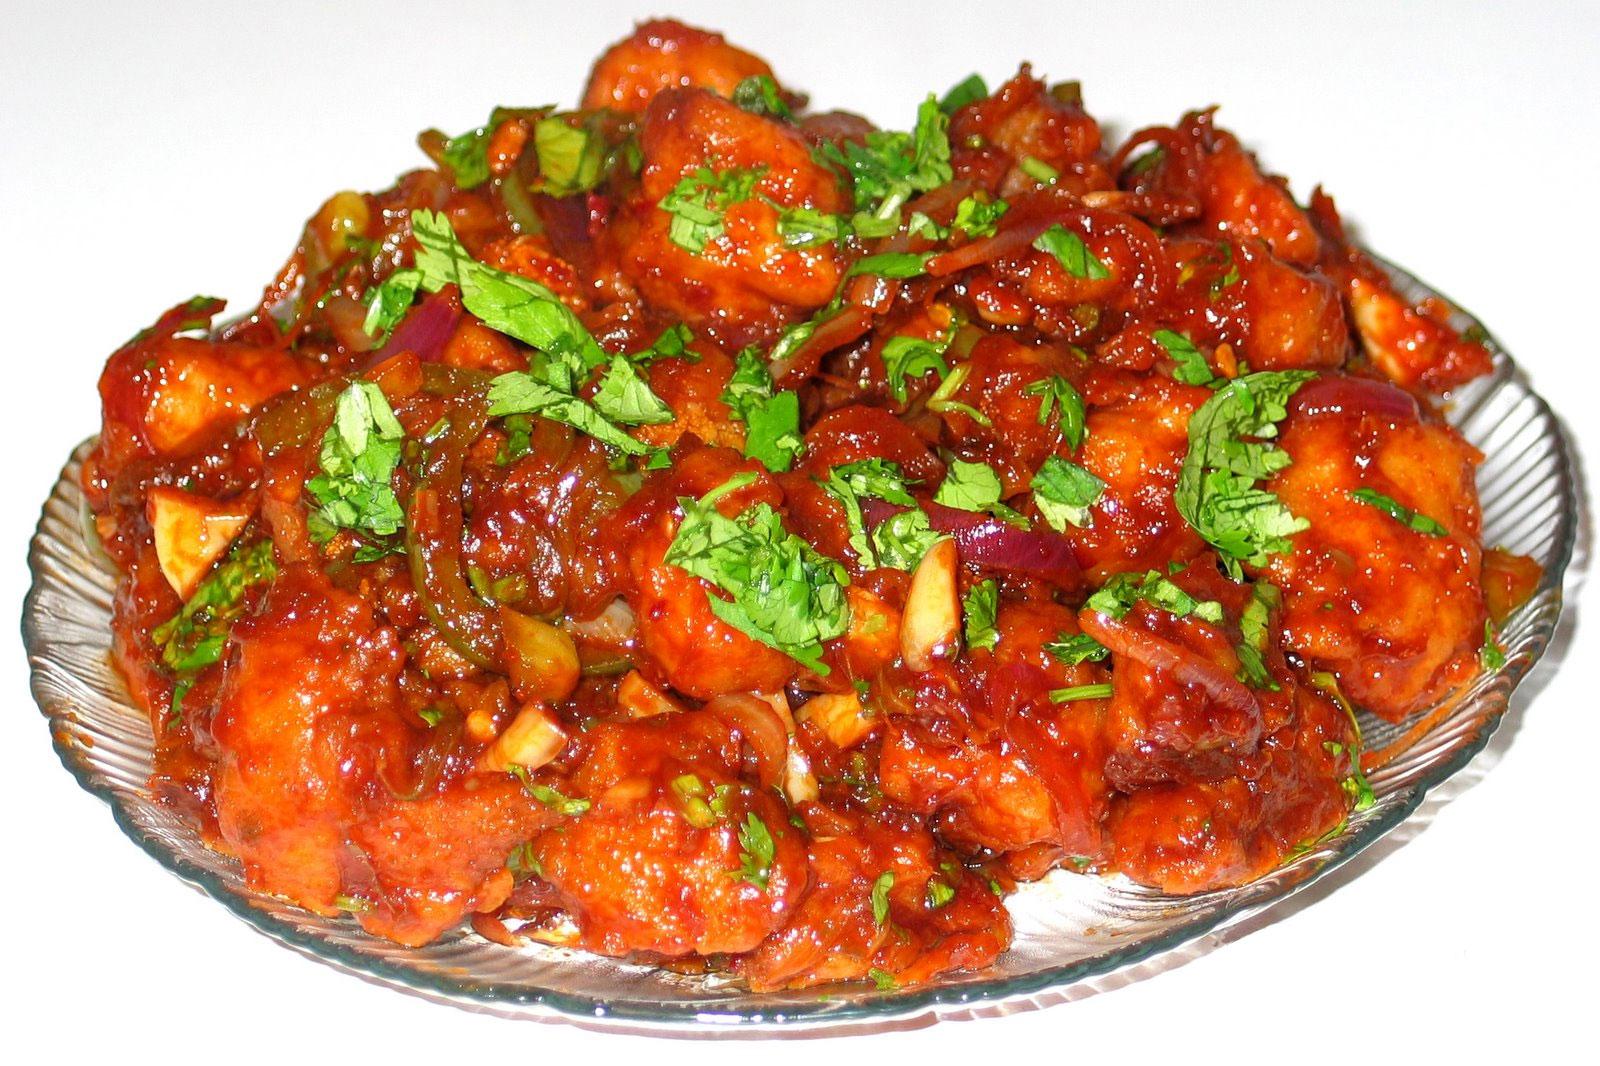 Coriander chinese cuisine veg for Asian cuisine catering